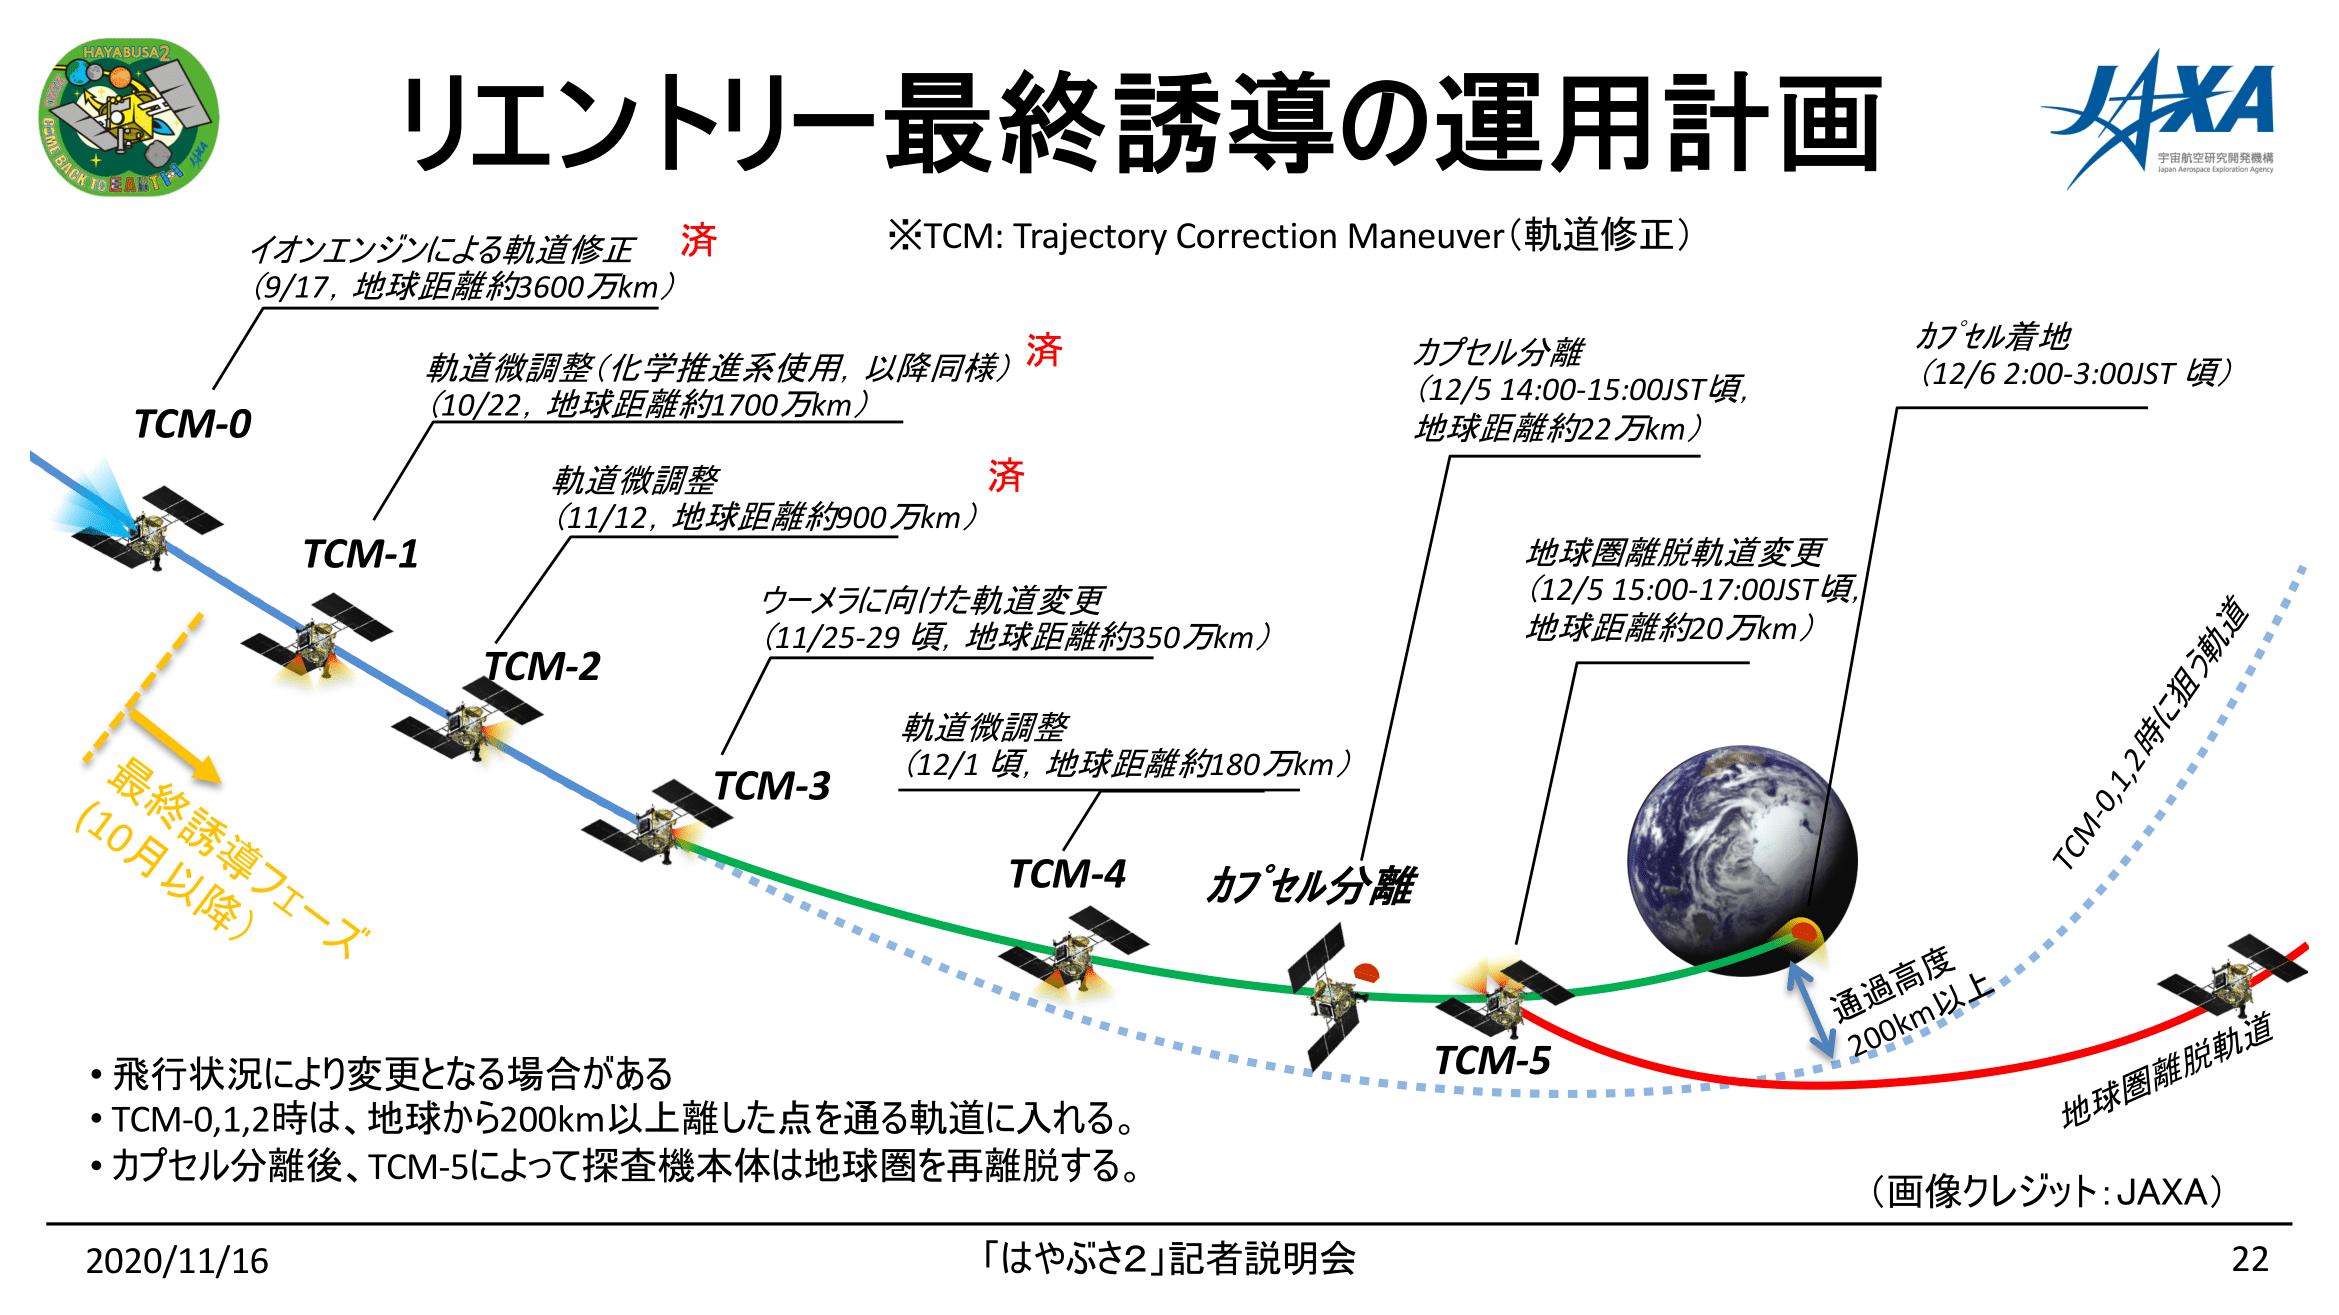 f:id:Imamura:20201116151401p:plain